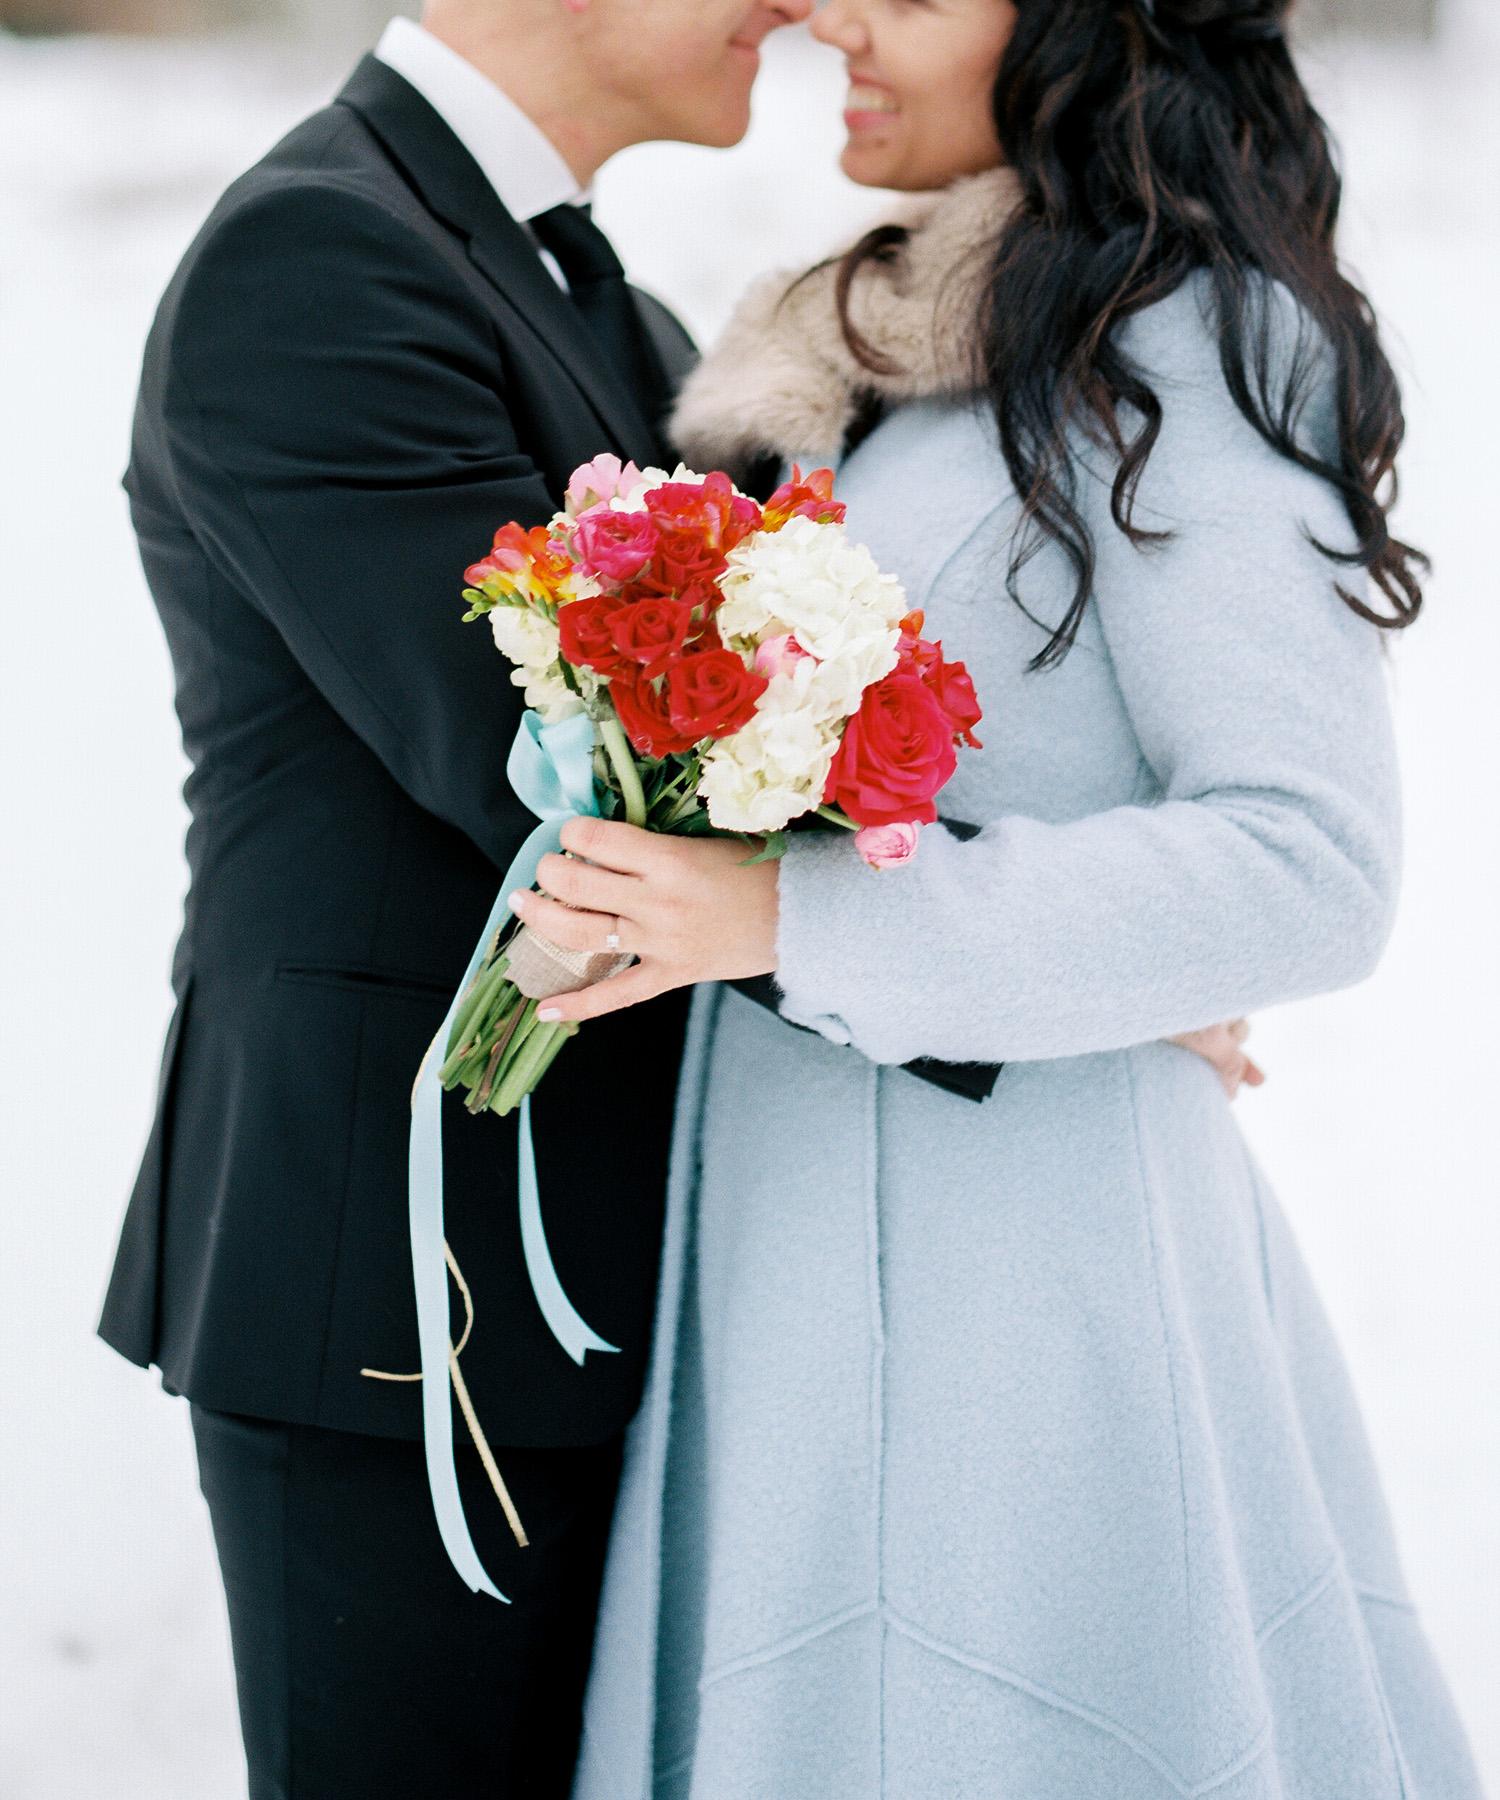 Winter Bride and Groom Wedding Photography.jpg